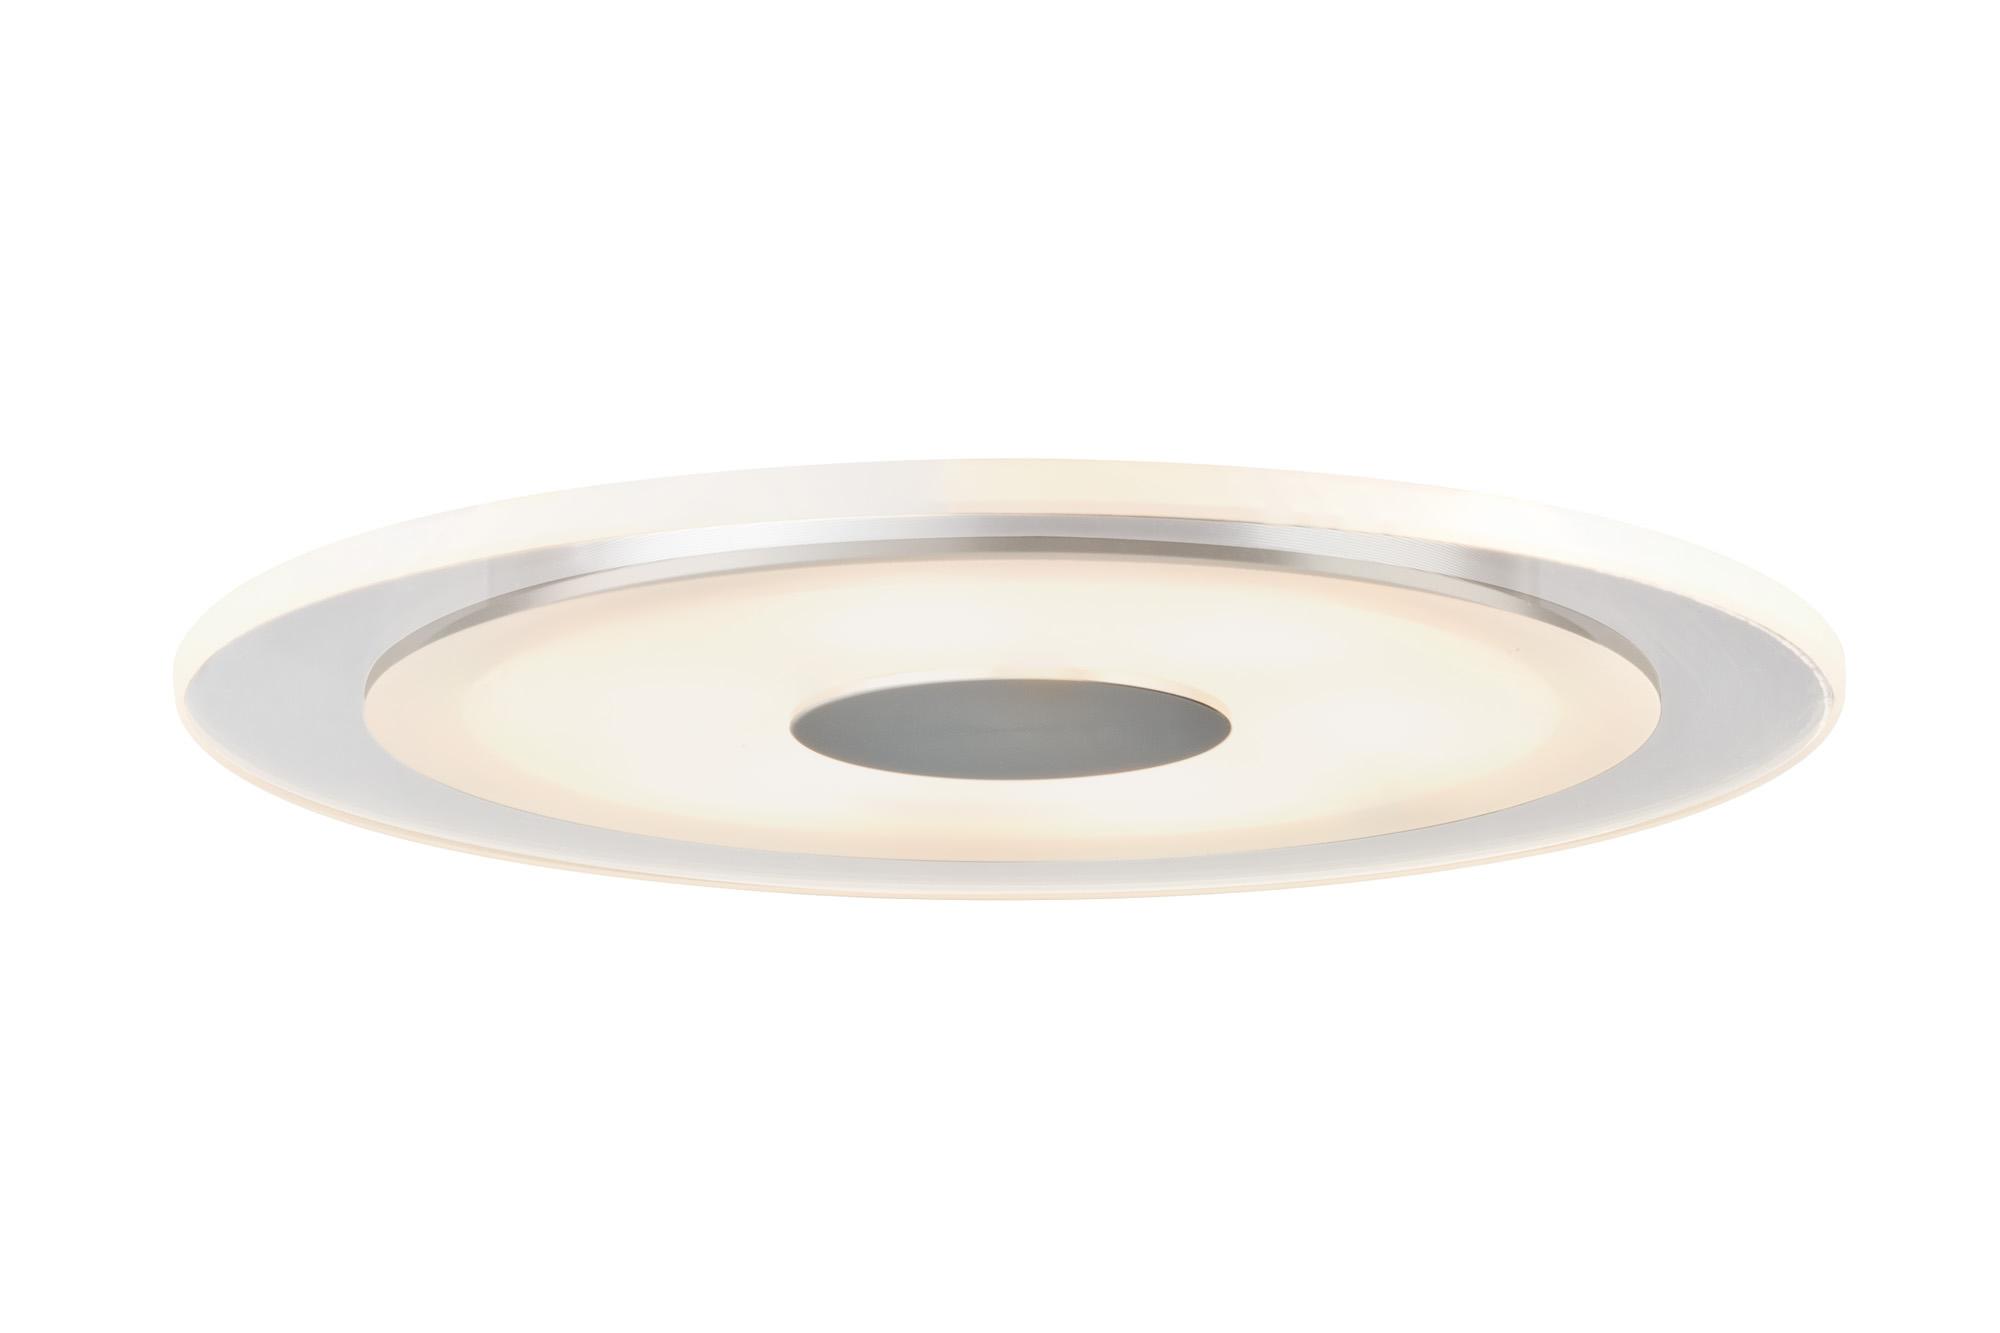 Paulmann. 92535 Светильник PremiumEBL Set Whirl rund LED 1x6W 350mA